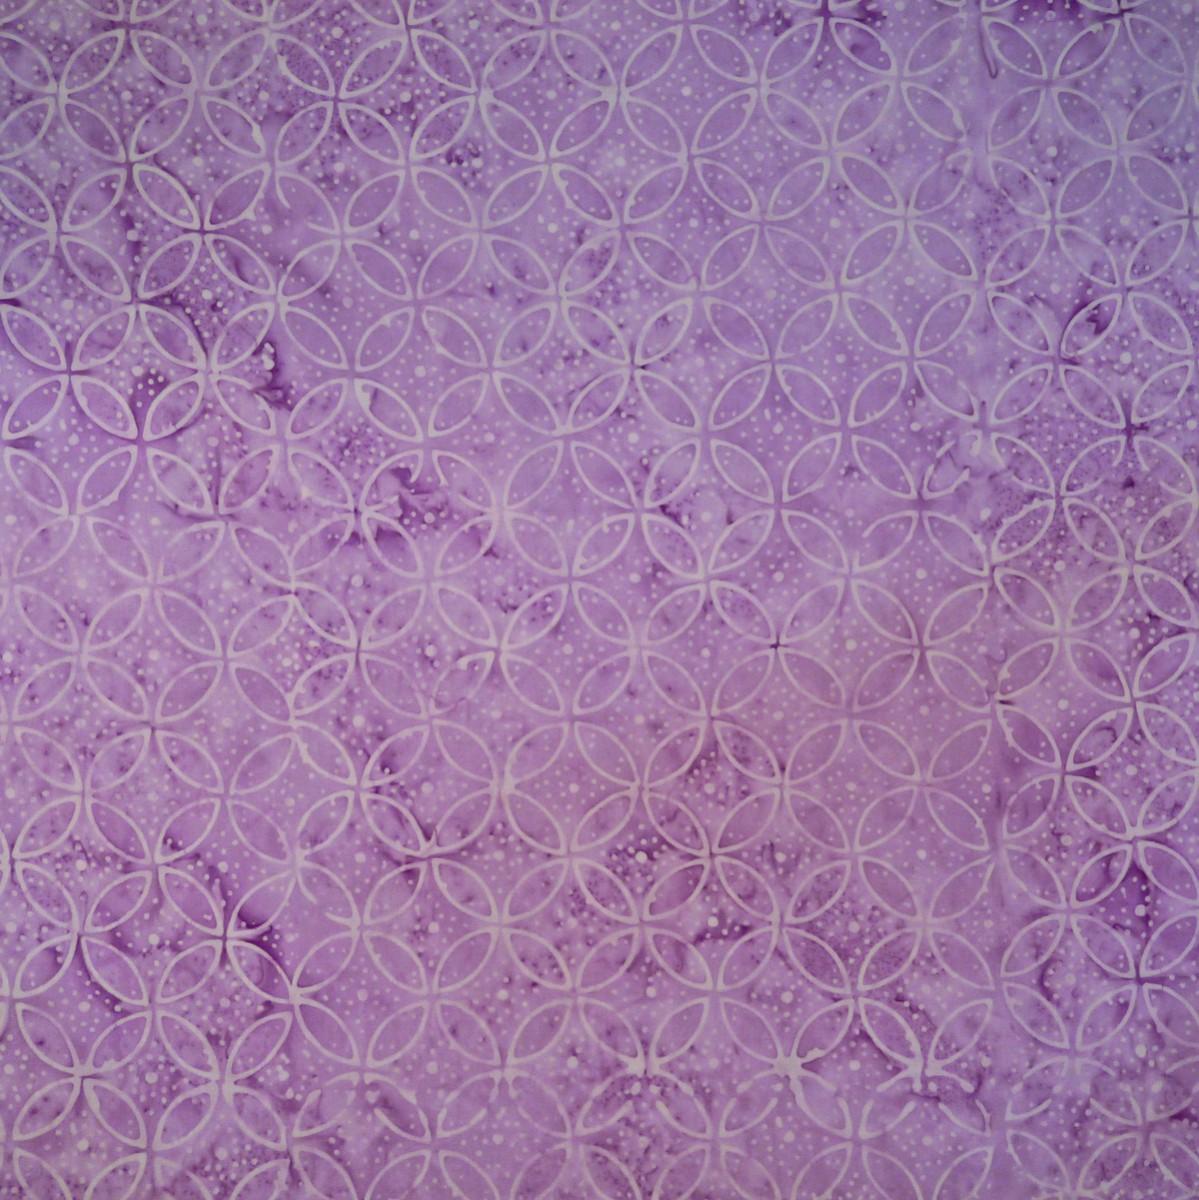 PM-15-3325 Gentle Lavender (1)